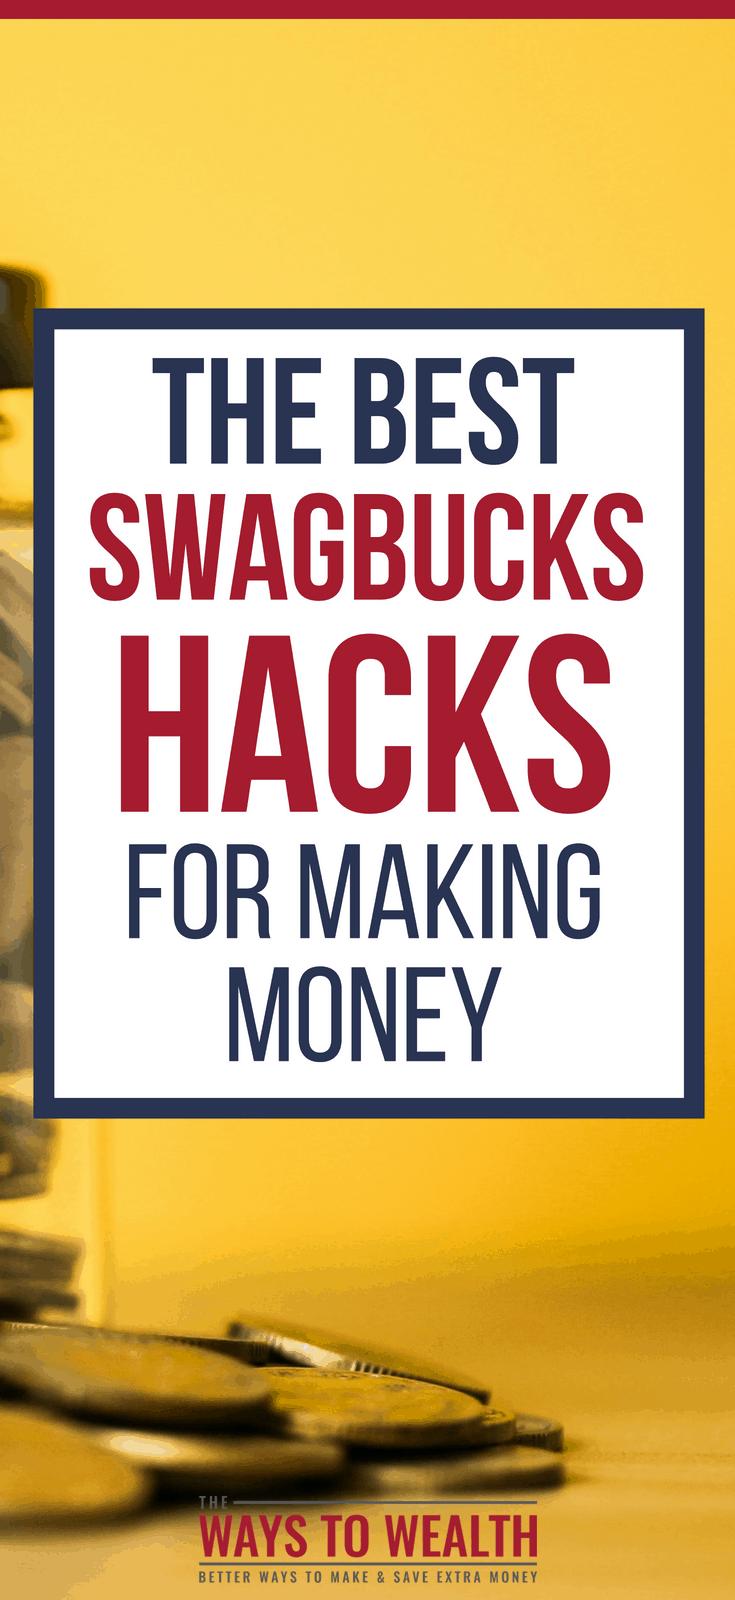 Swagbucks Hacks For Making Moneyswagbucks hacks | swagbucks tips | swagbucks hacks make money | swagbucks hacks gift cards#thewaystowealth #review #makemoneyonline